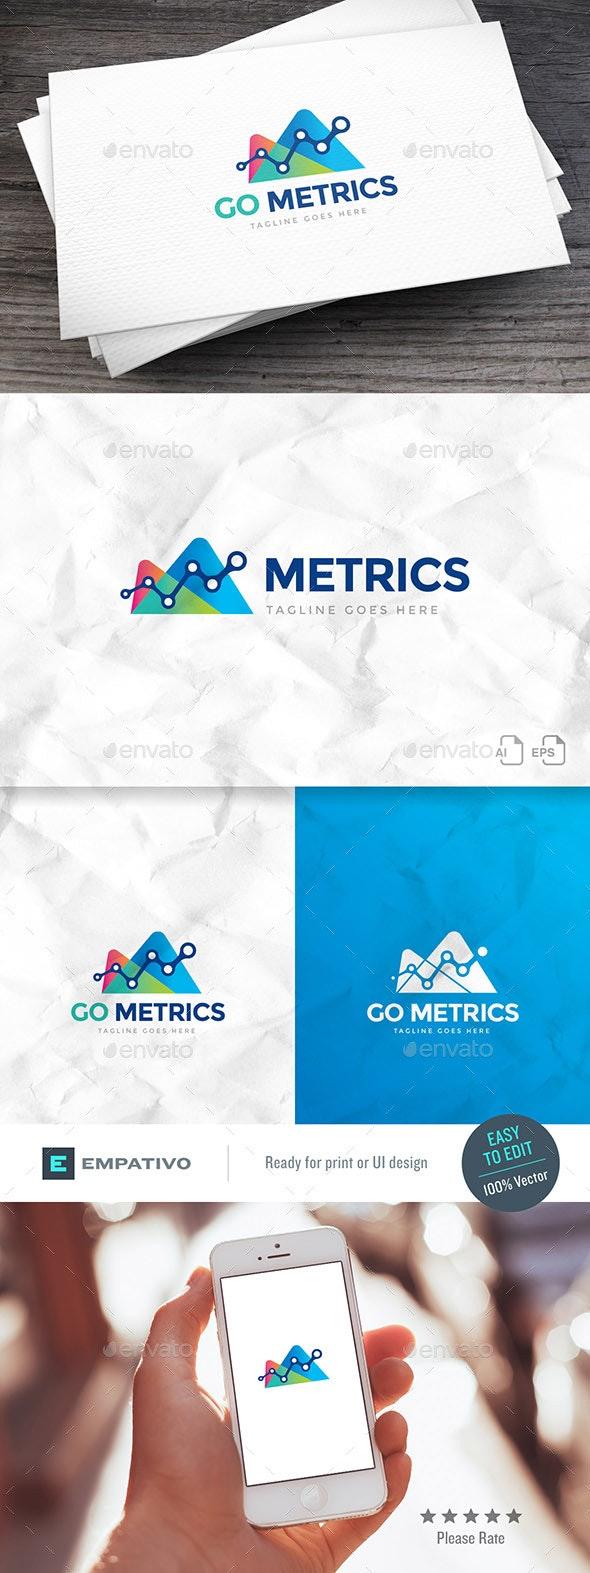 Go Metrics Logo Template